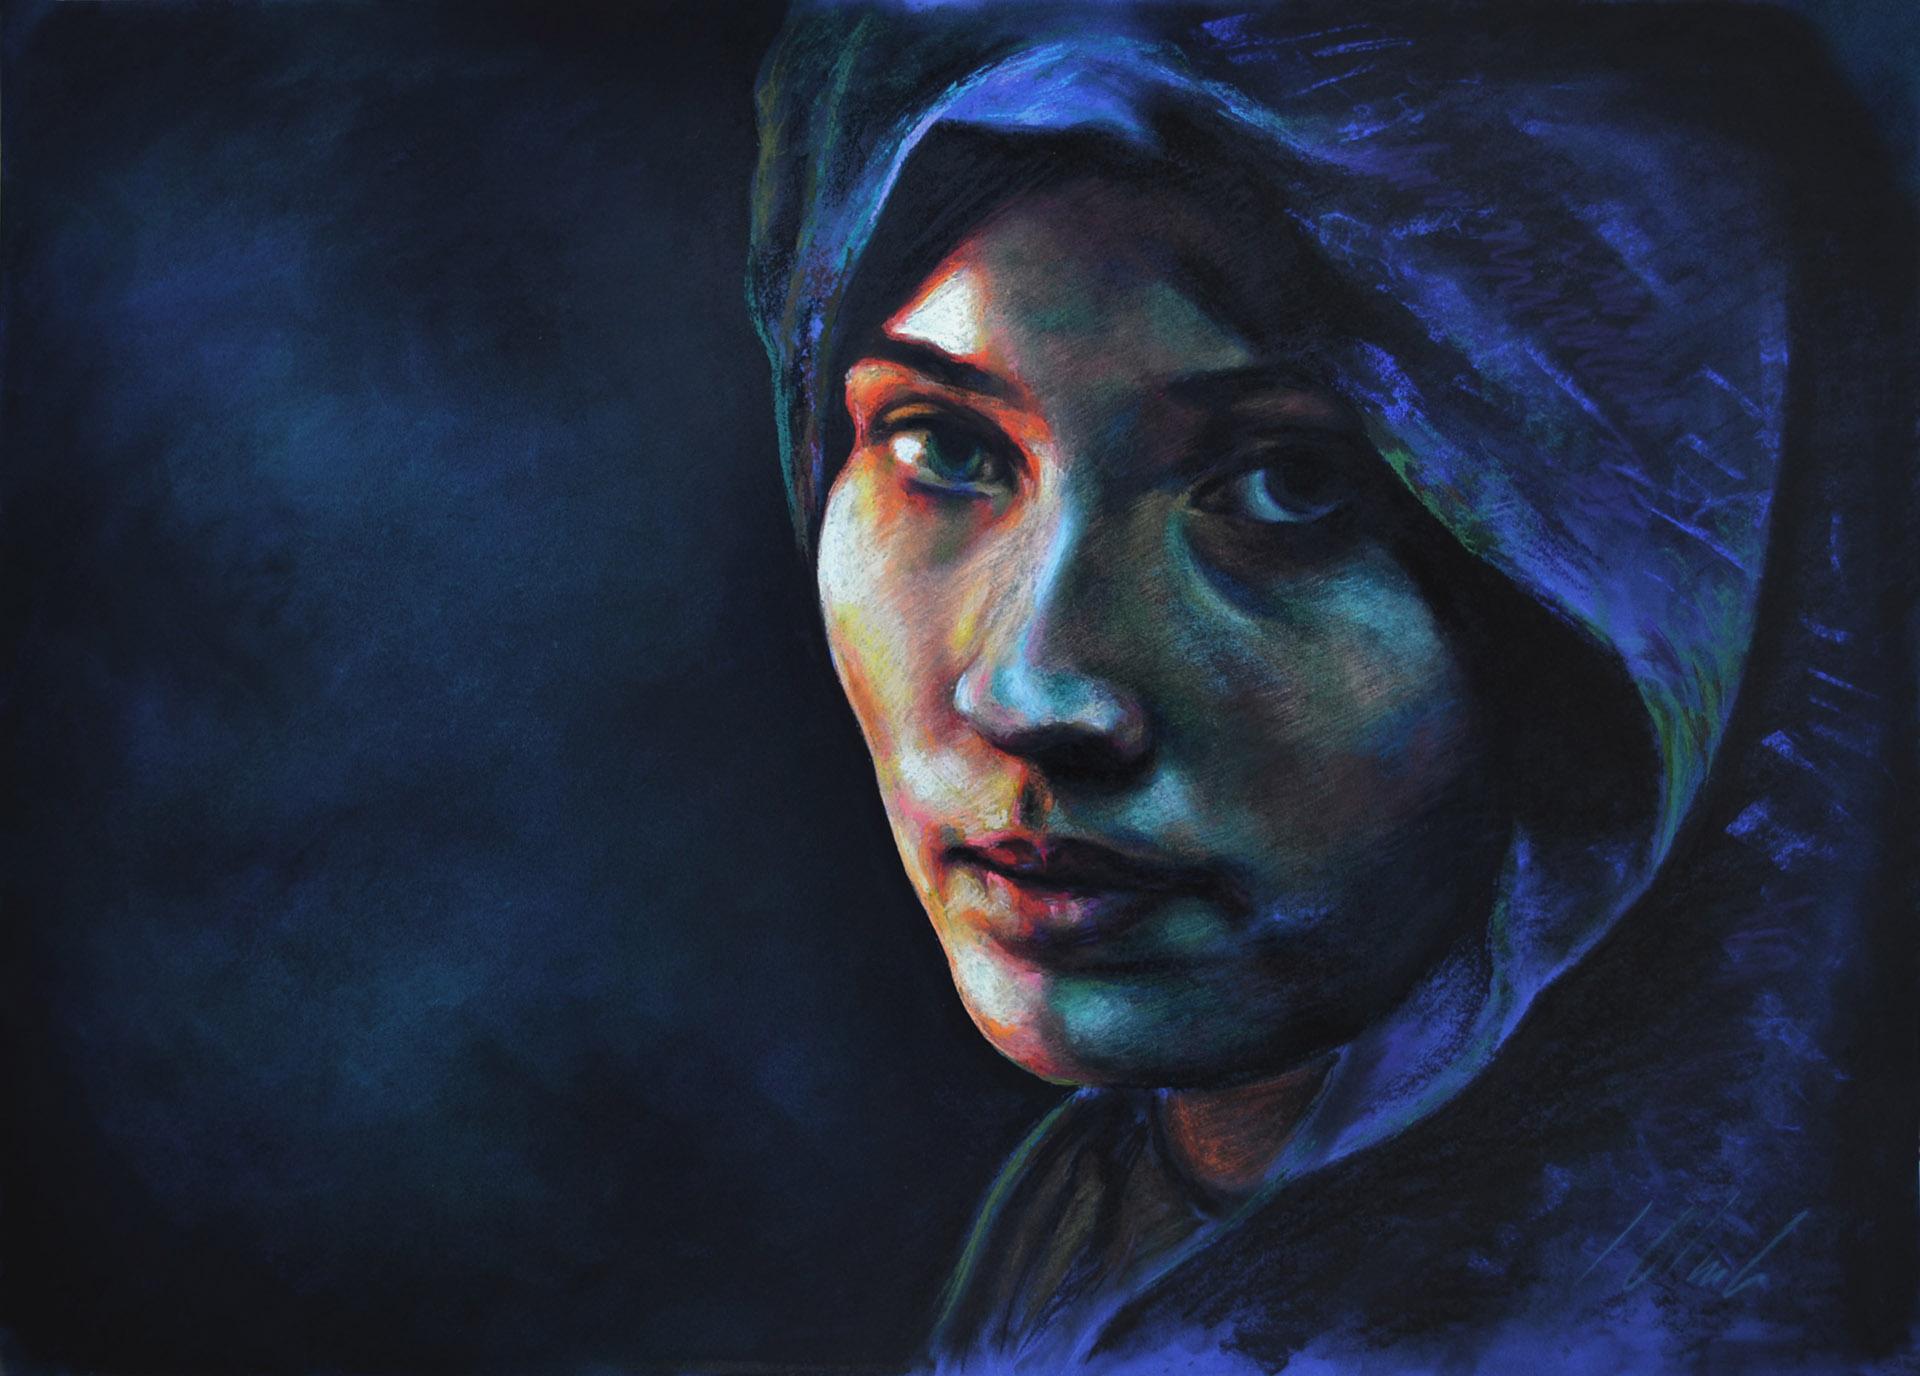 Retrato sobre fondo azul. Javier Olmedo. Pastel, 70 x 50cm. Año 2014. PV 150 €